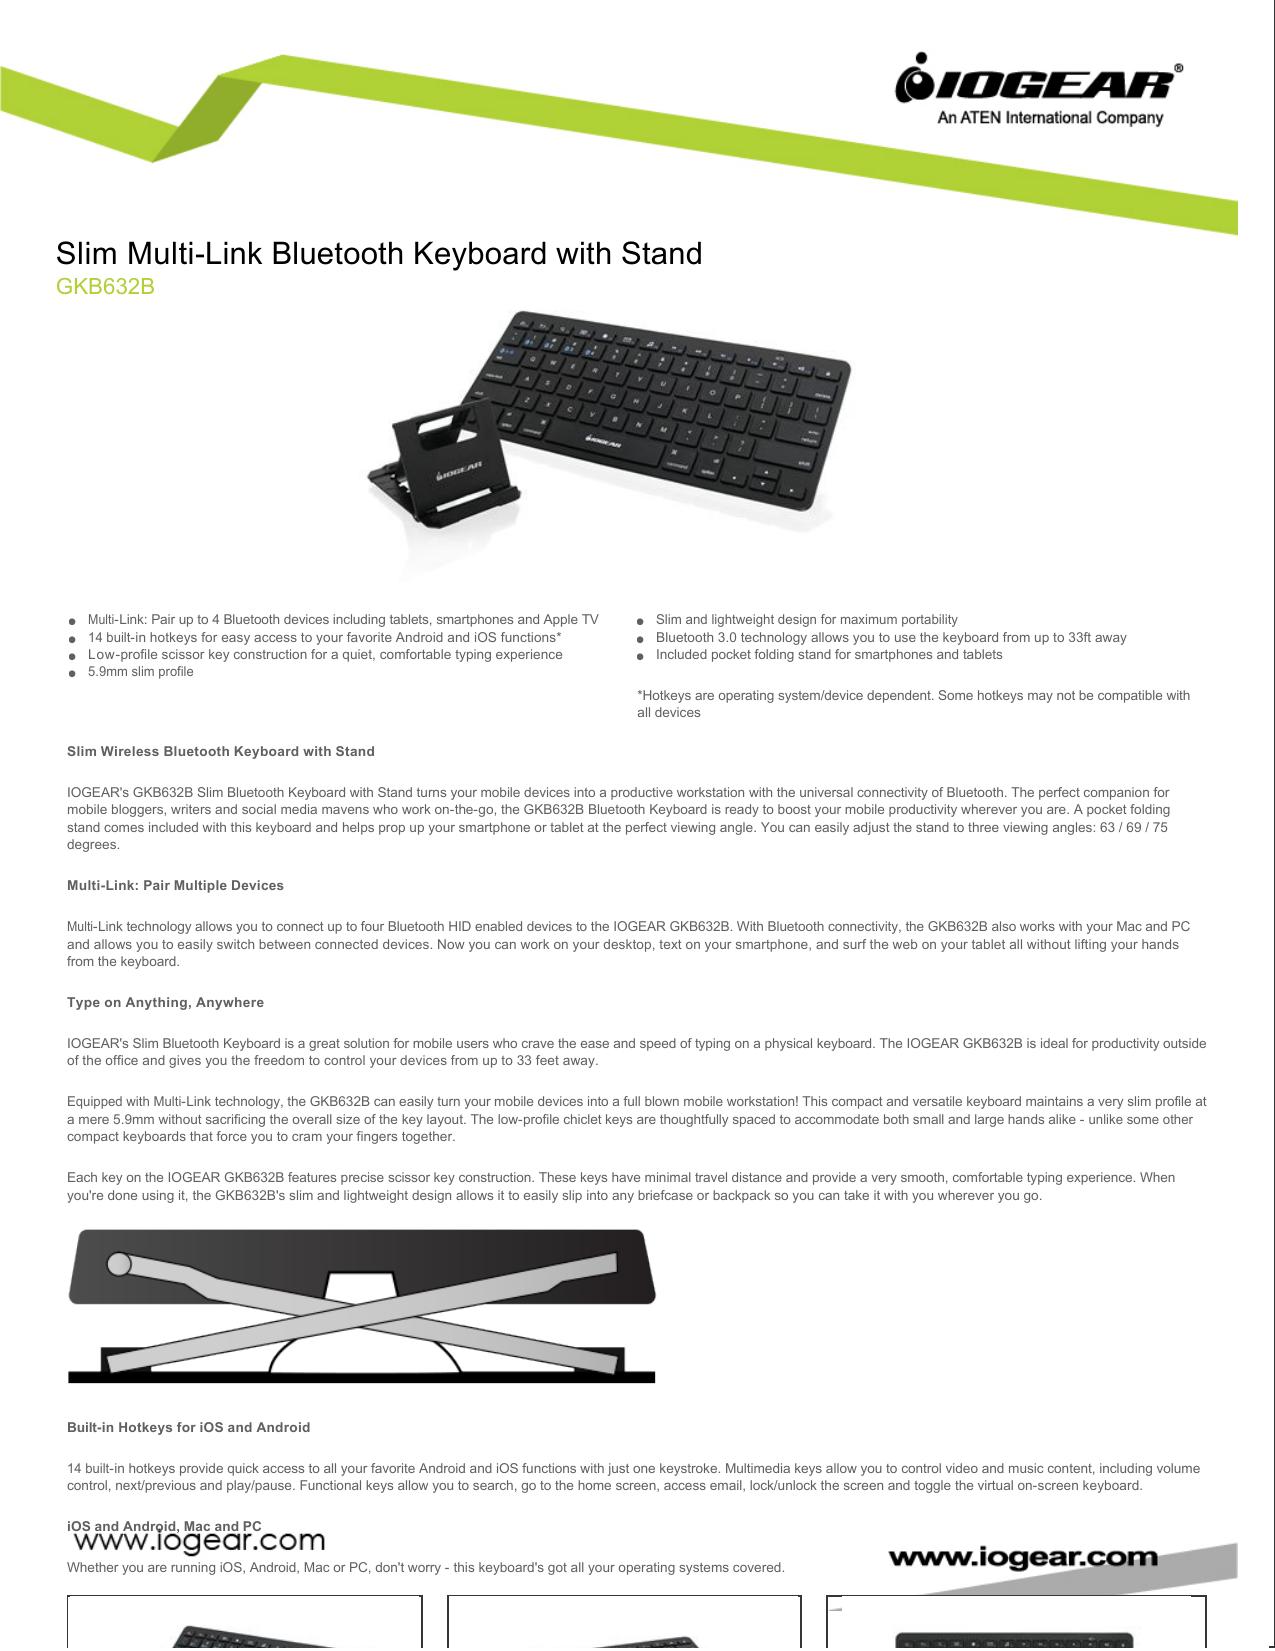 Slim Multi-Link Bluetooth Keyboard with Stand | manualzz com